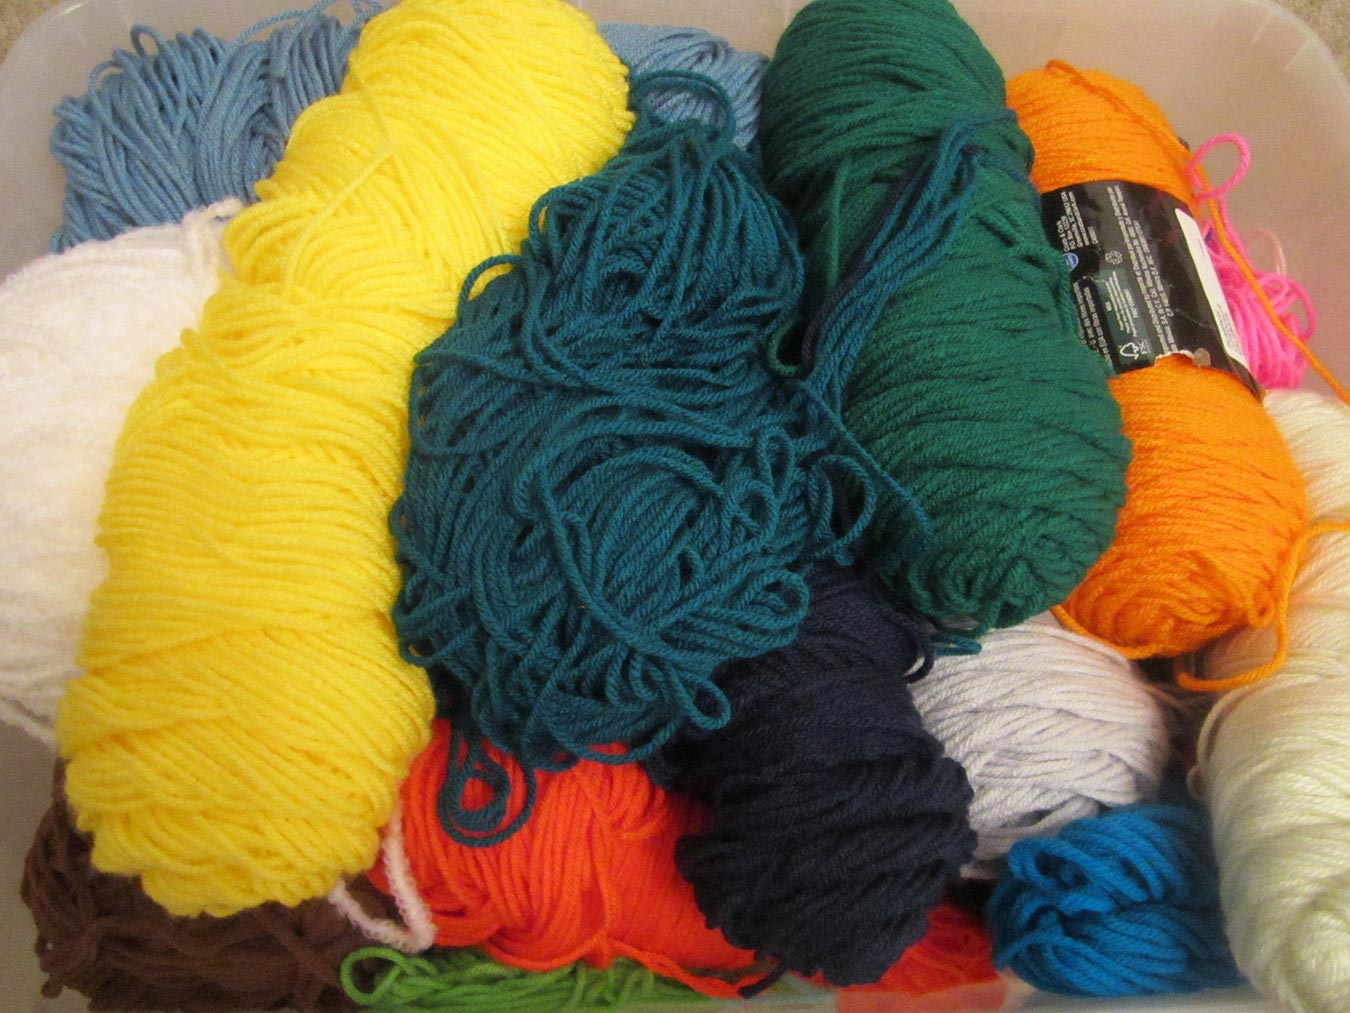 11 Reasons I'm Hooked on Crochet